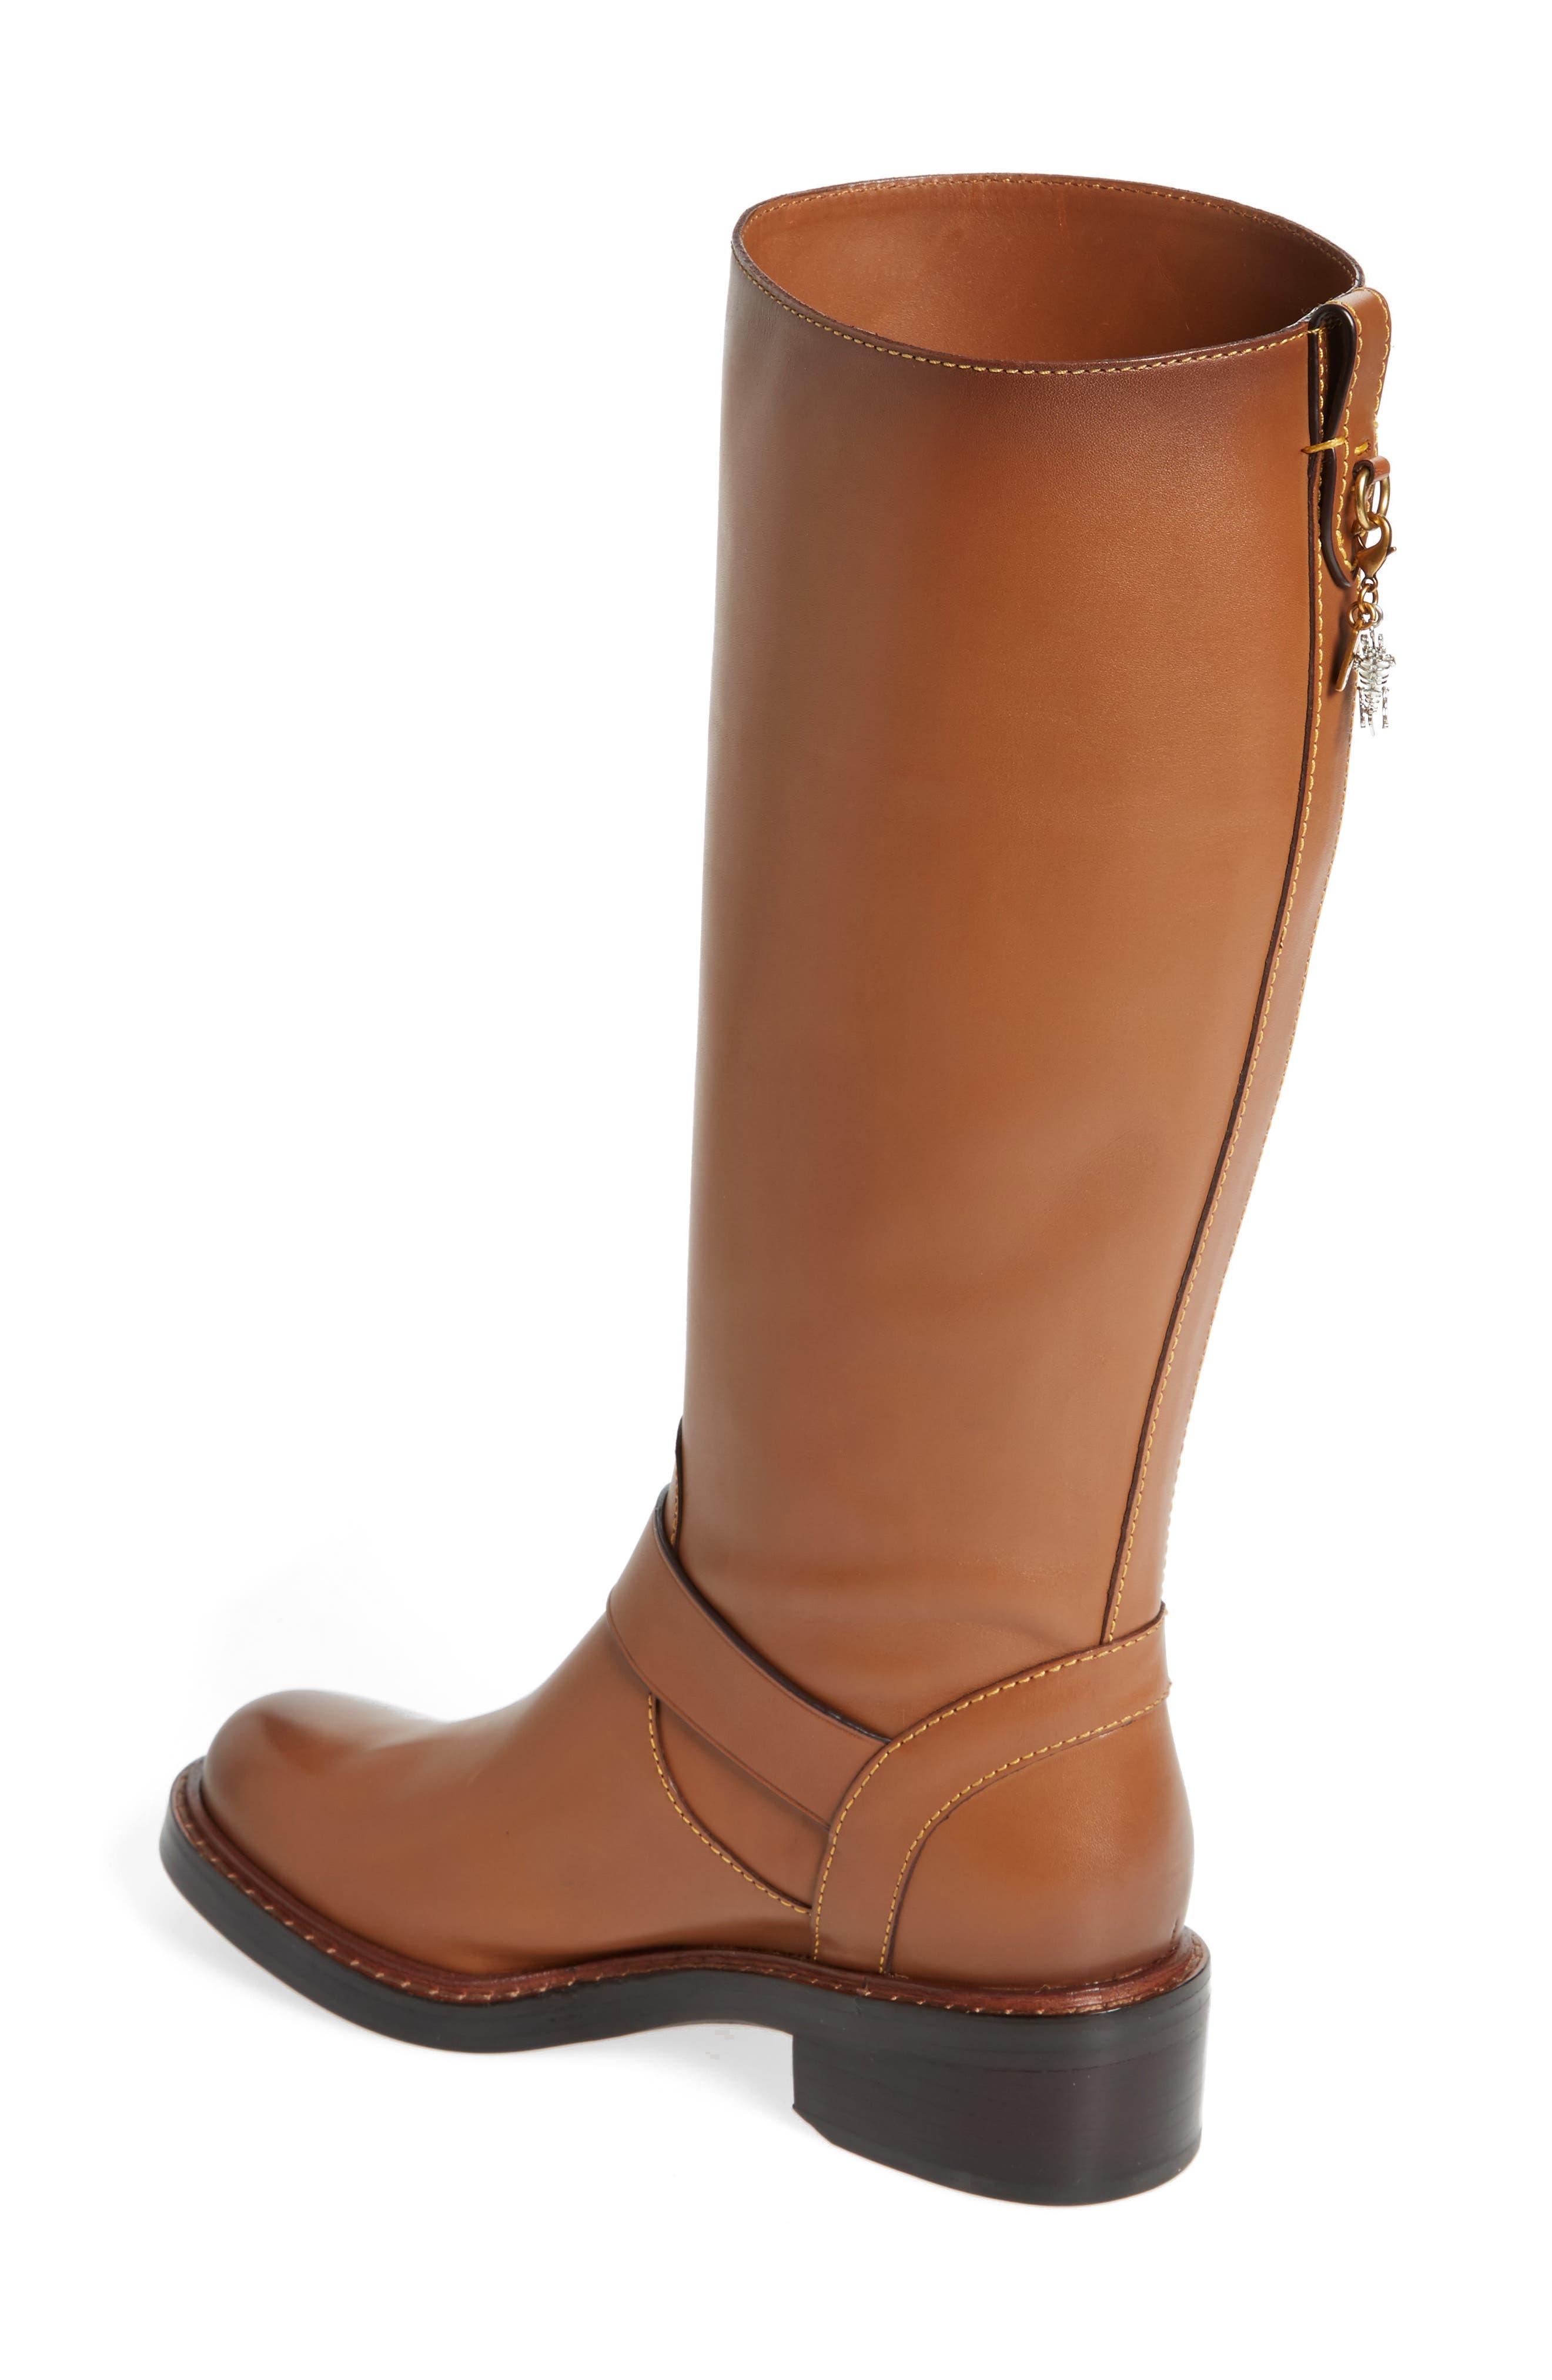 Alternate Image 2  - COACH Sutton Riding Boot (Women)